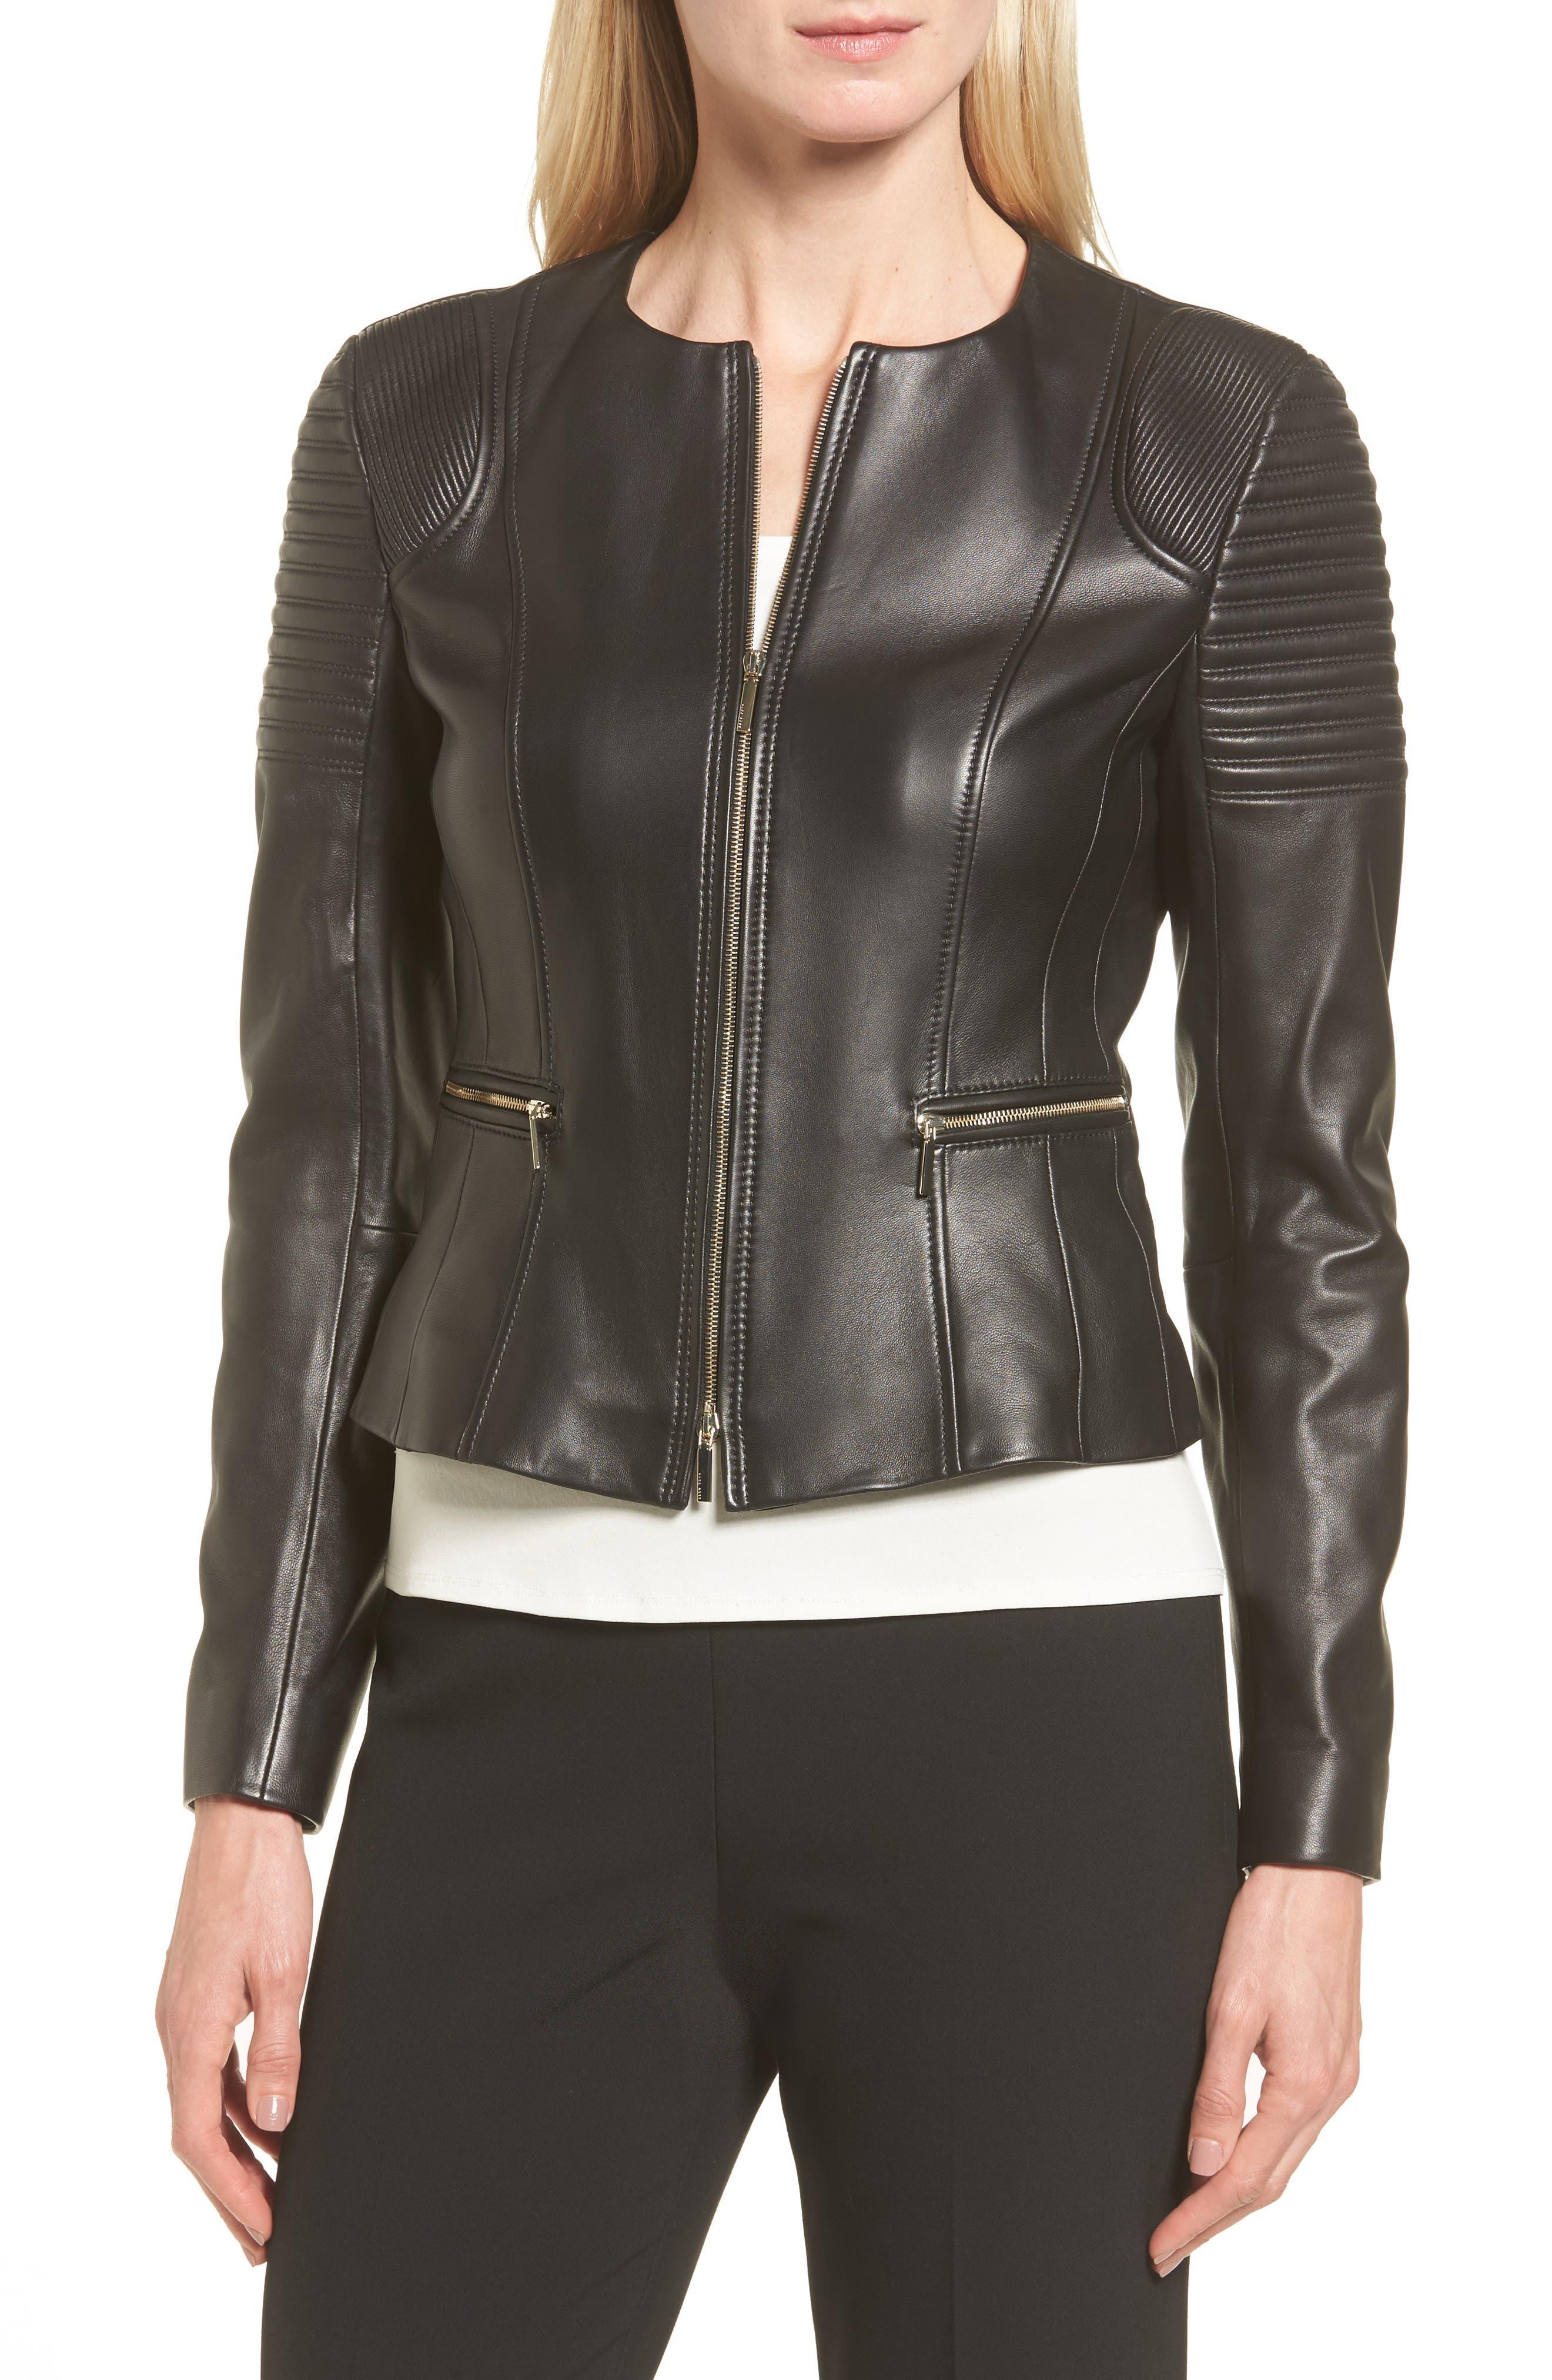 Sakumaya Leather Jacket,                             Alternate thumbnail 4, color,                             Black